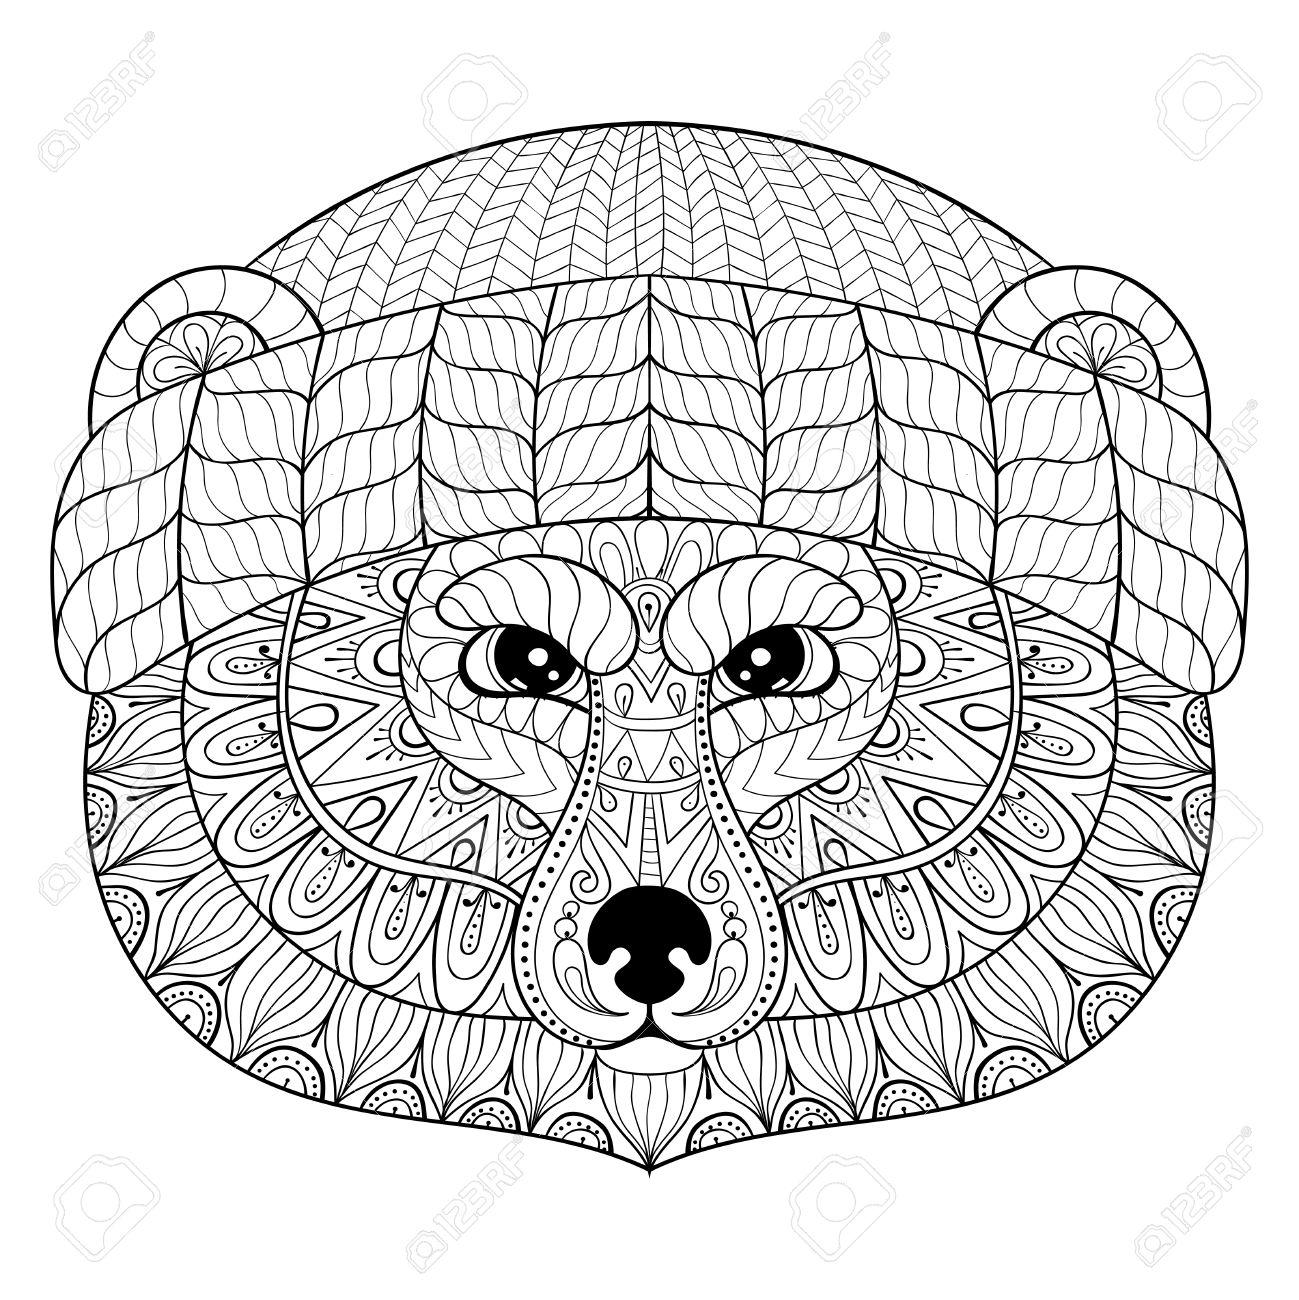 Panda Gesicht Malvorlage Coloring And Malvorlagan